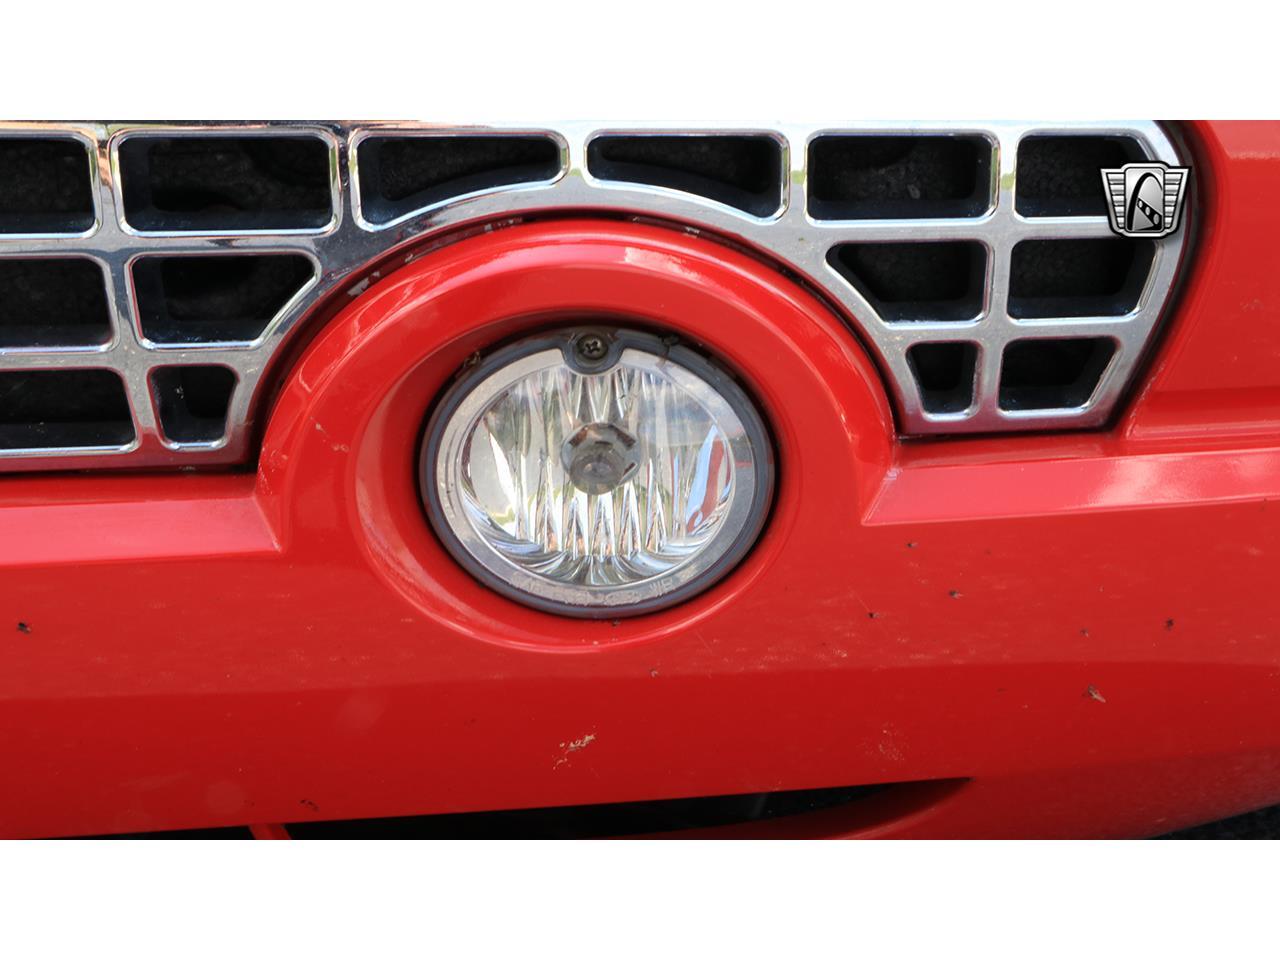 2005 Ford Thunderbird (CC-1351618) for sale in O'Fallon, Illinois